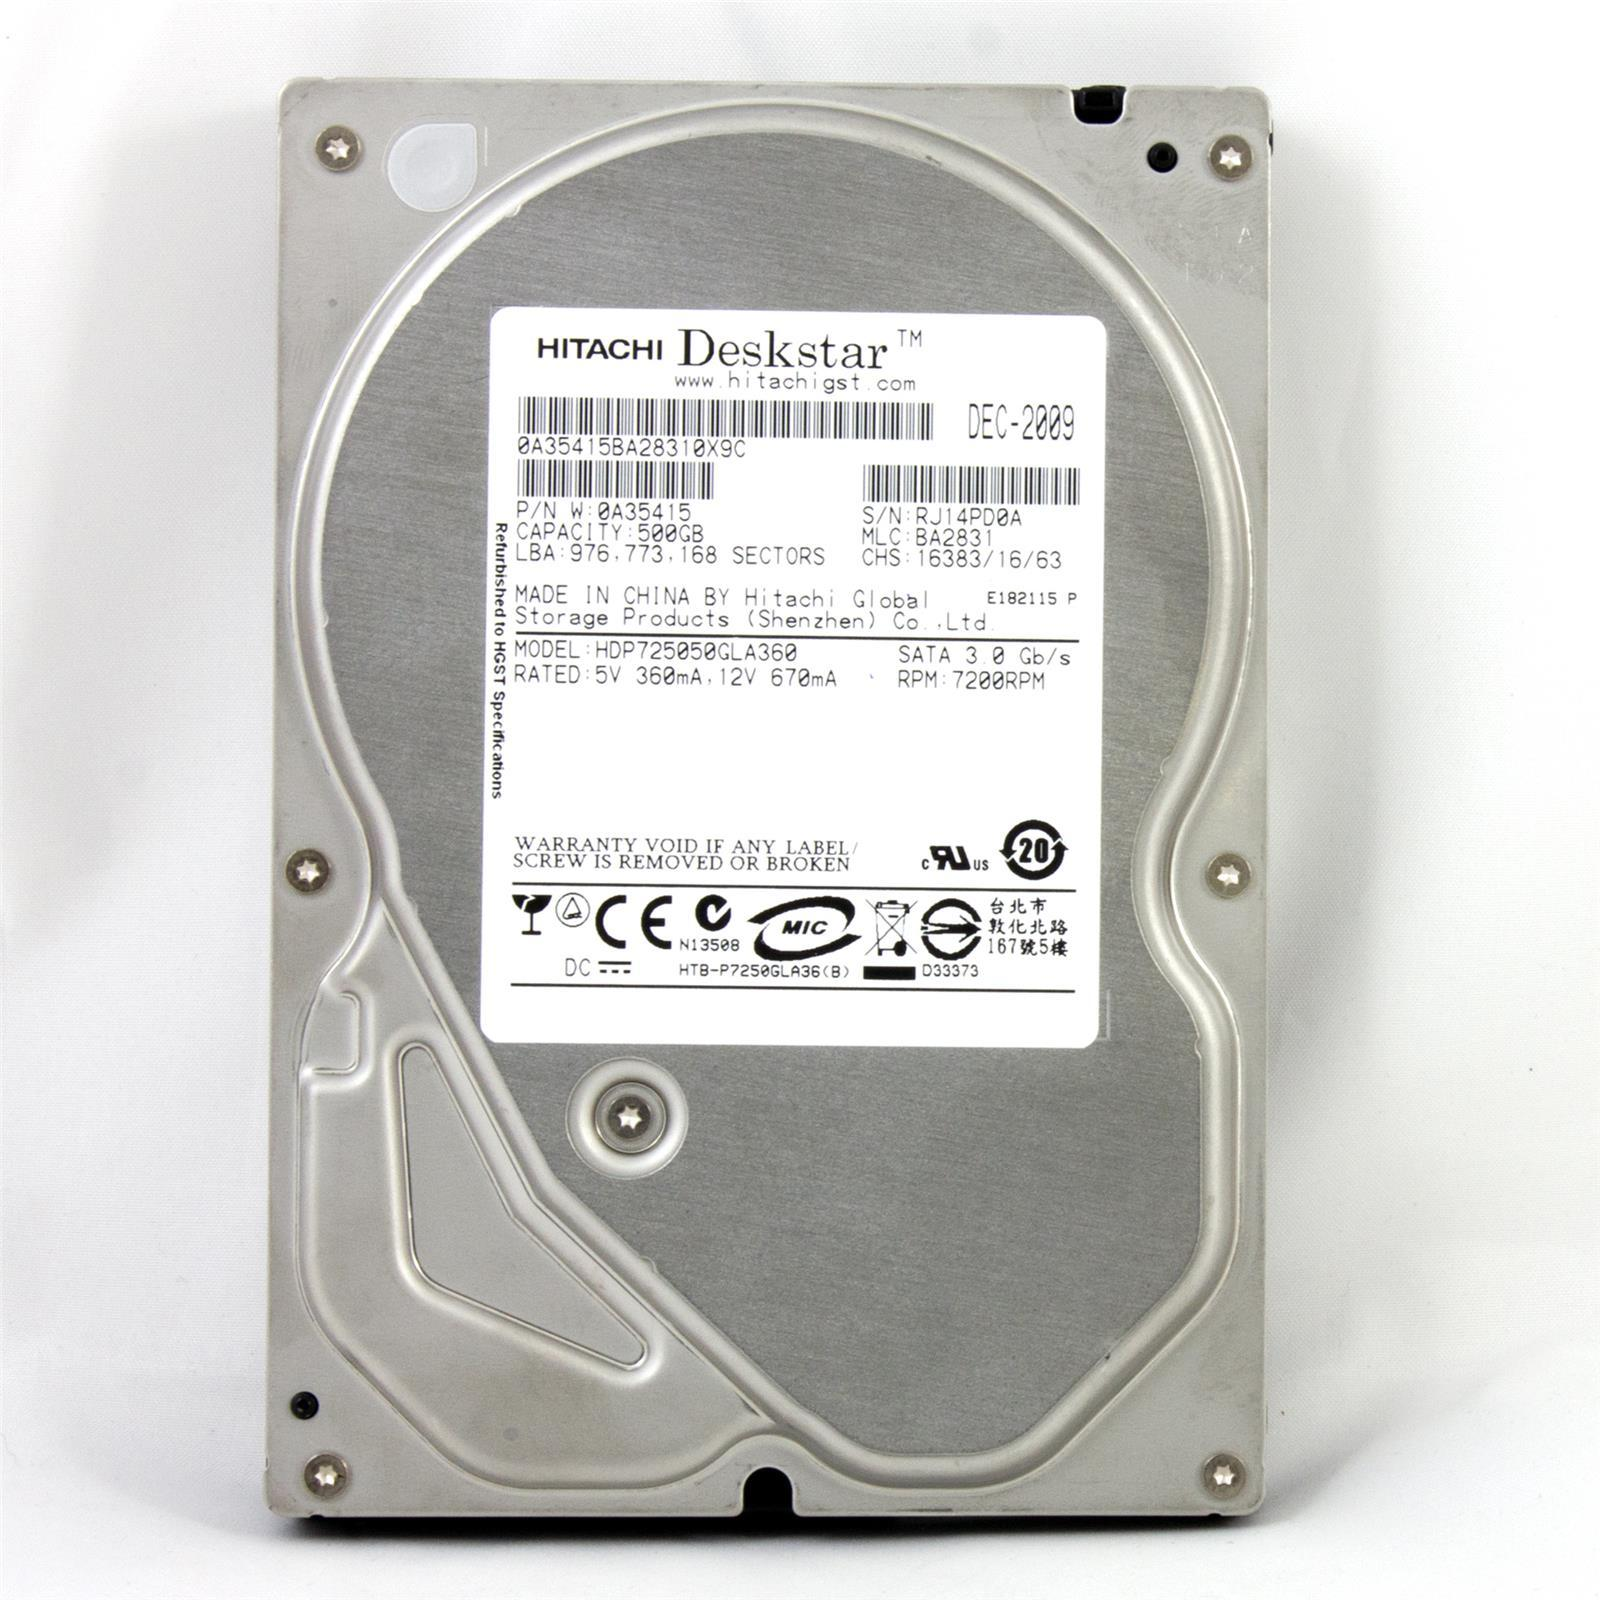 Hitachi Deskstar T7K500 Disque dur 500 Go - 3,5'' SATA